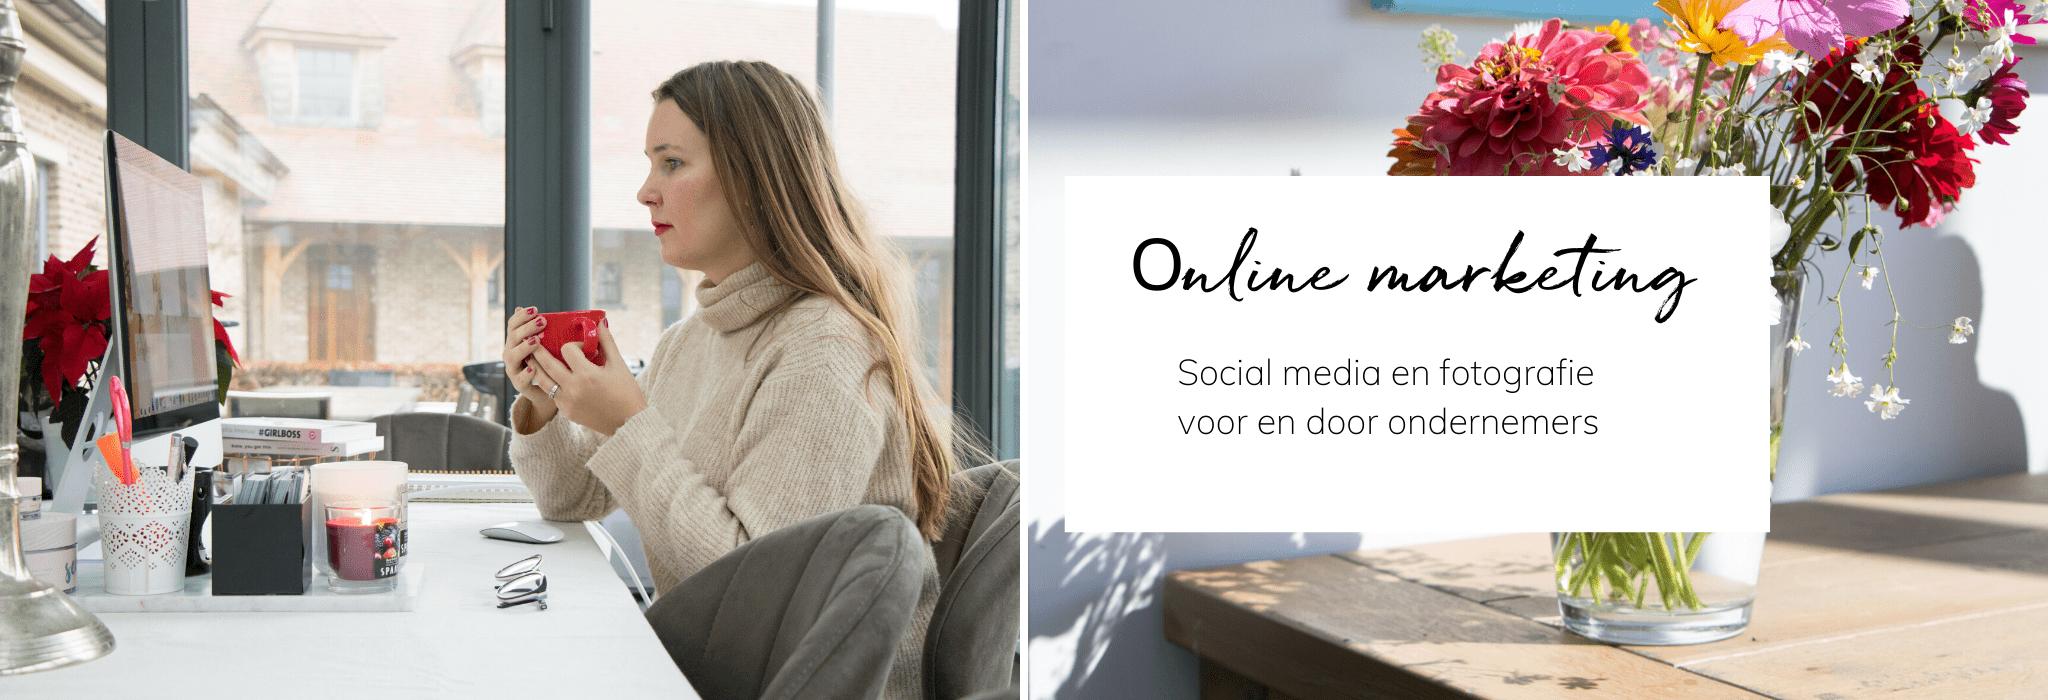 Online marketeer regio Kampenhout Vlaams-Brabant